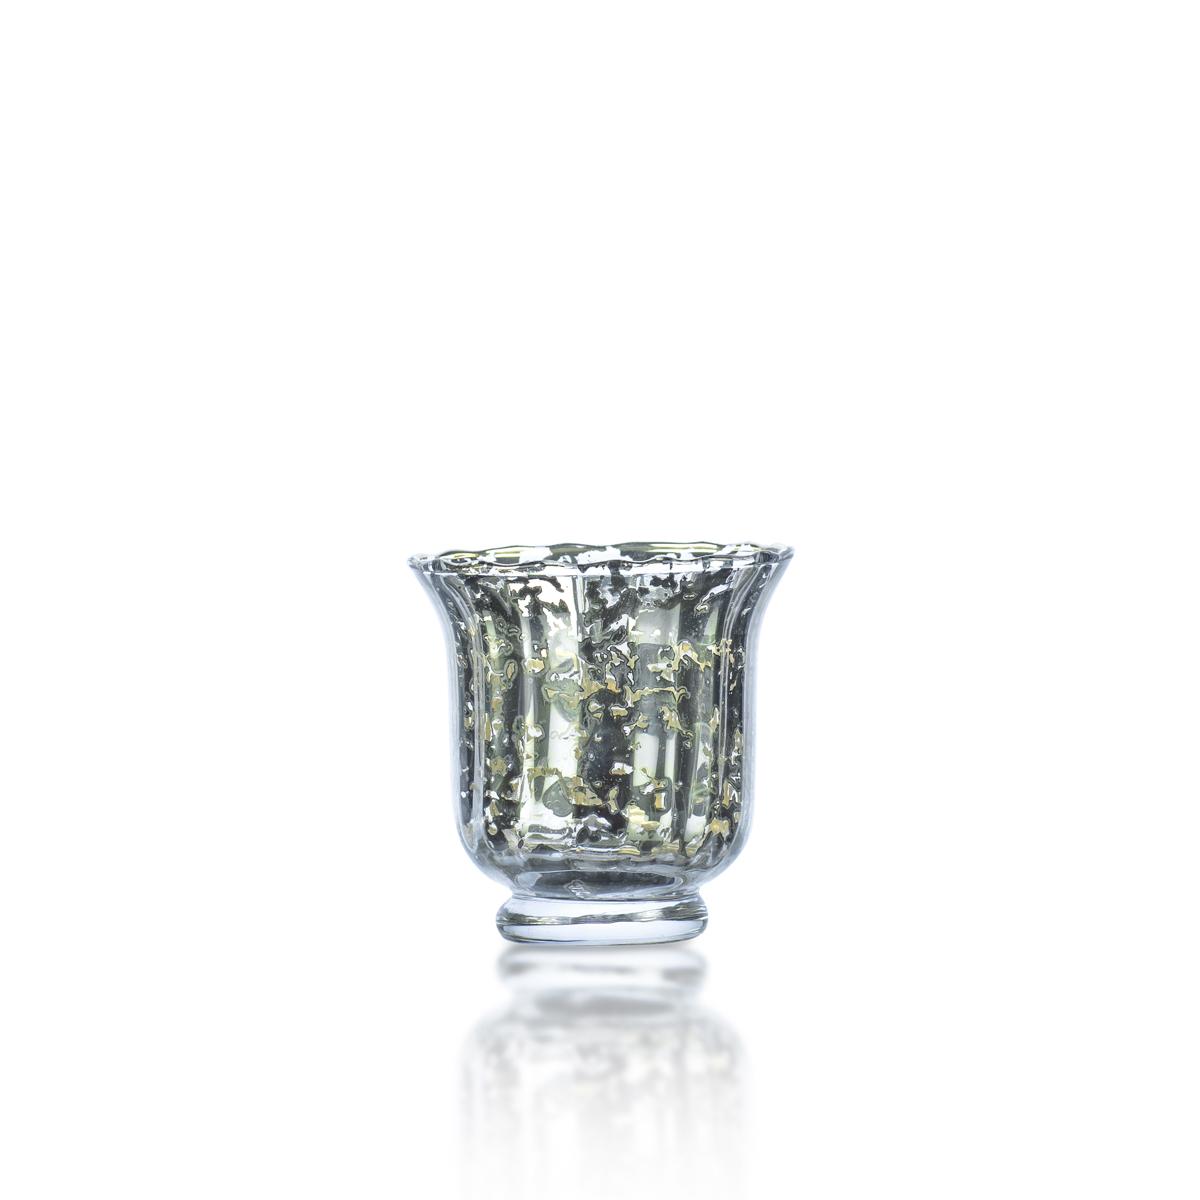 Vintage glass sm